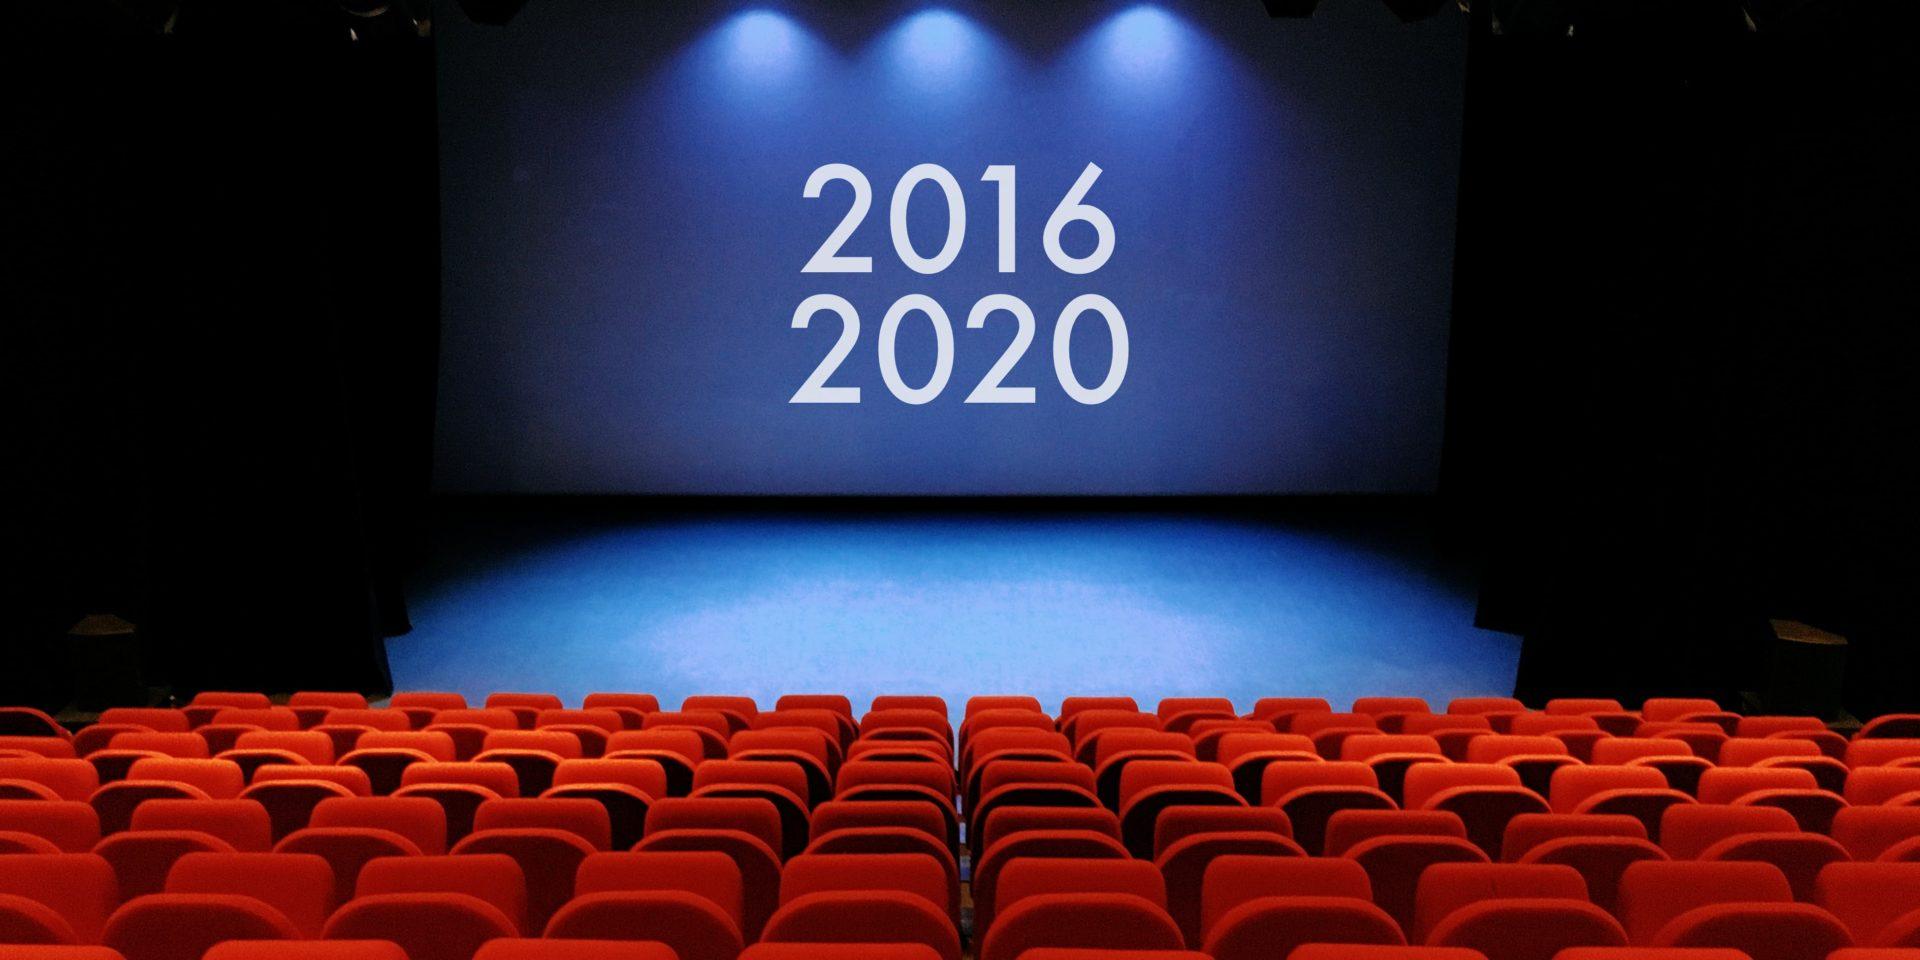 2016-2020